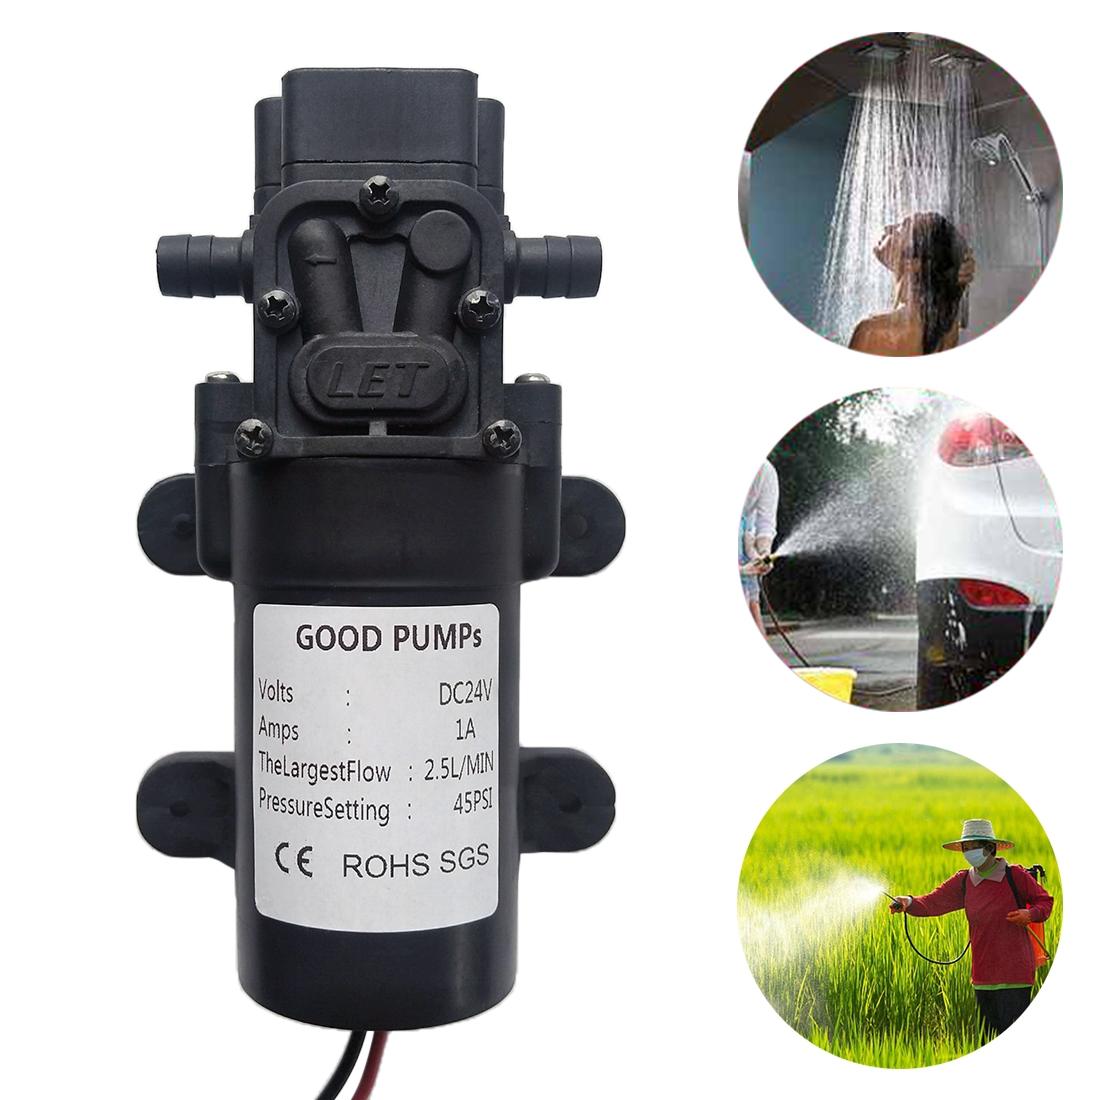 Diaphragm Reflux Mini Electric Water Pump 29W High Pressure Self-priming Water Pump for Car Washing / Irrigation, Voltage: 24V